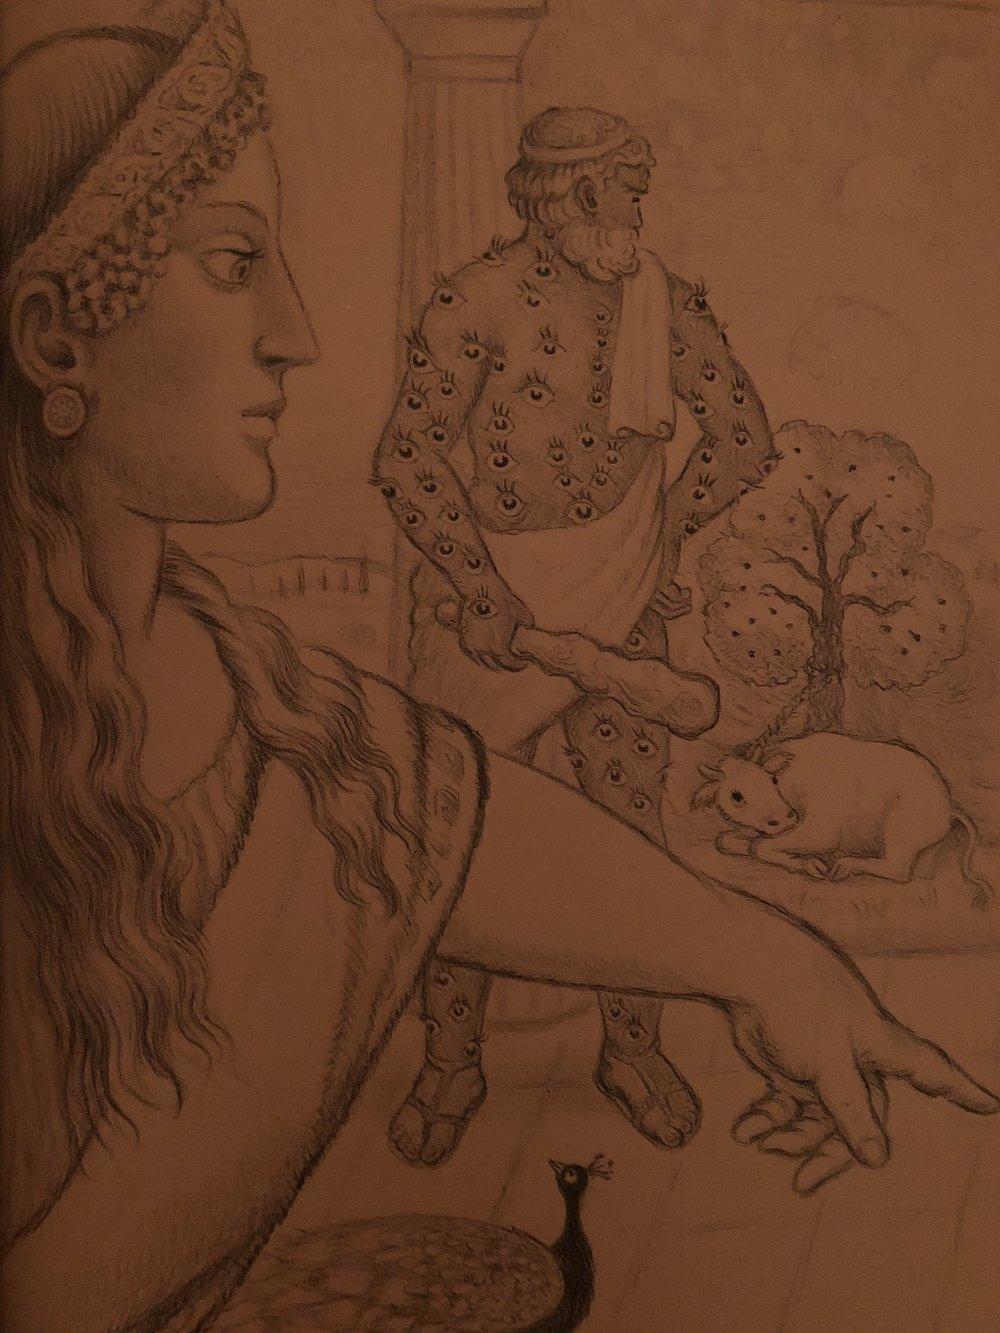 Hera, Argus , and Io.